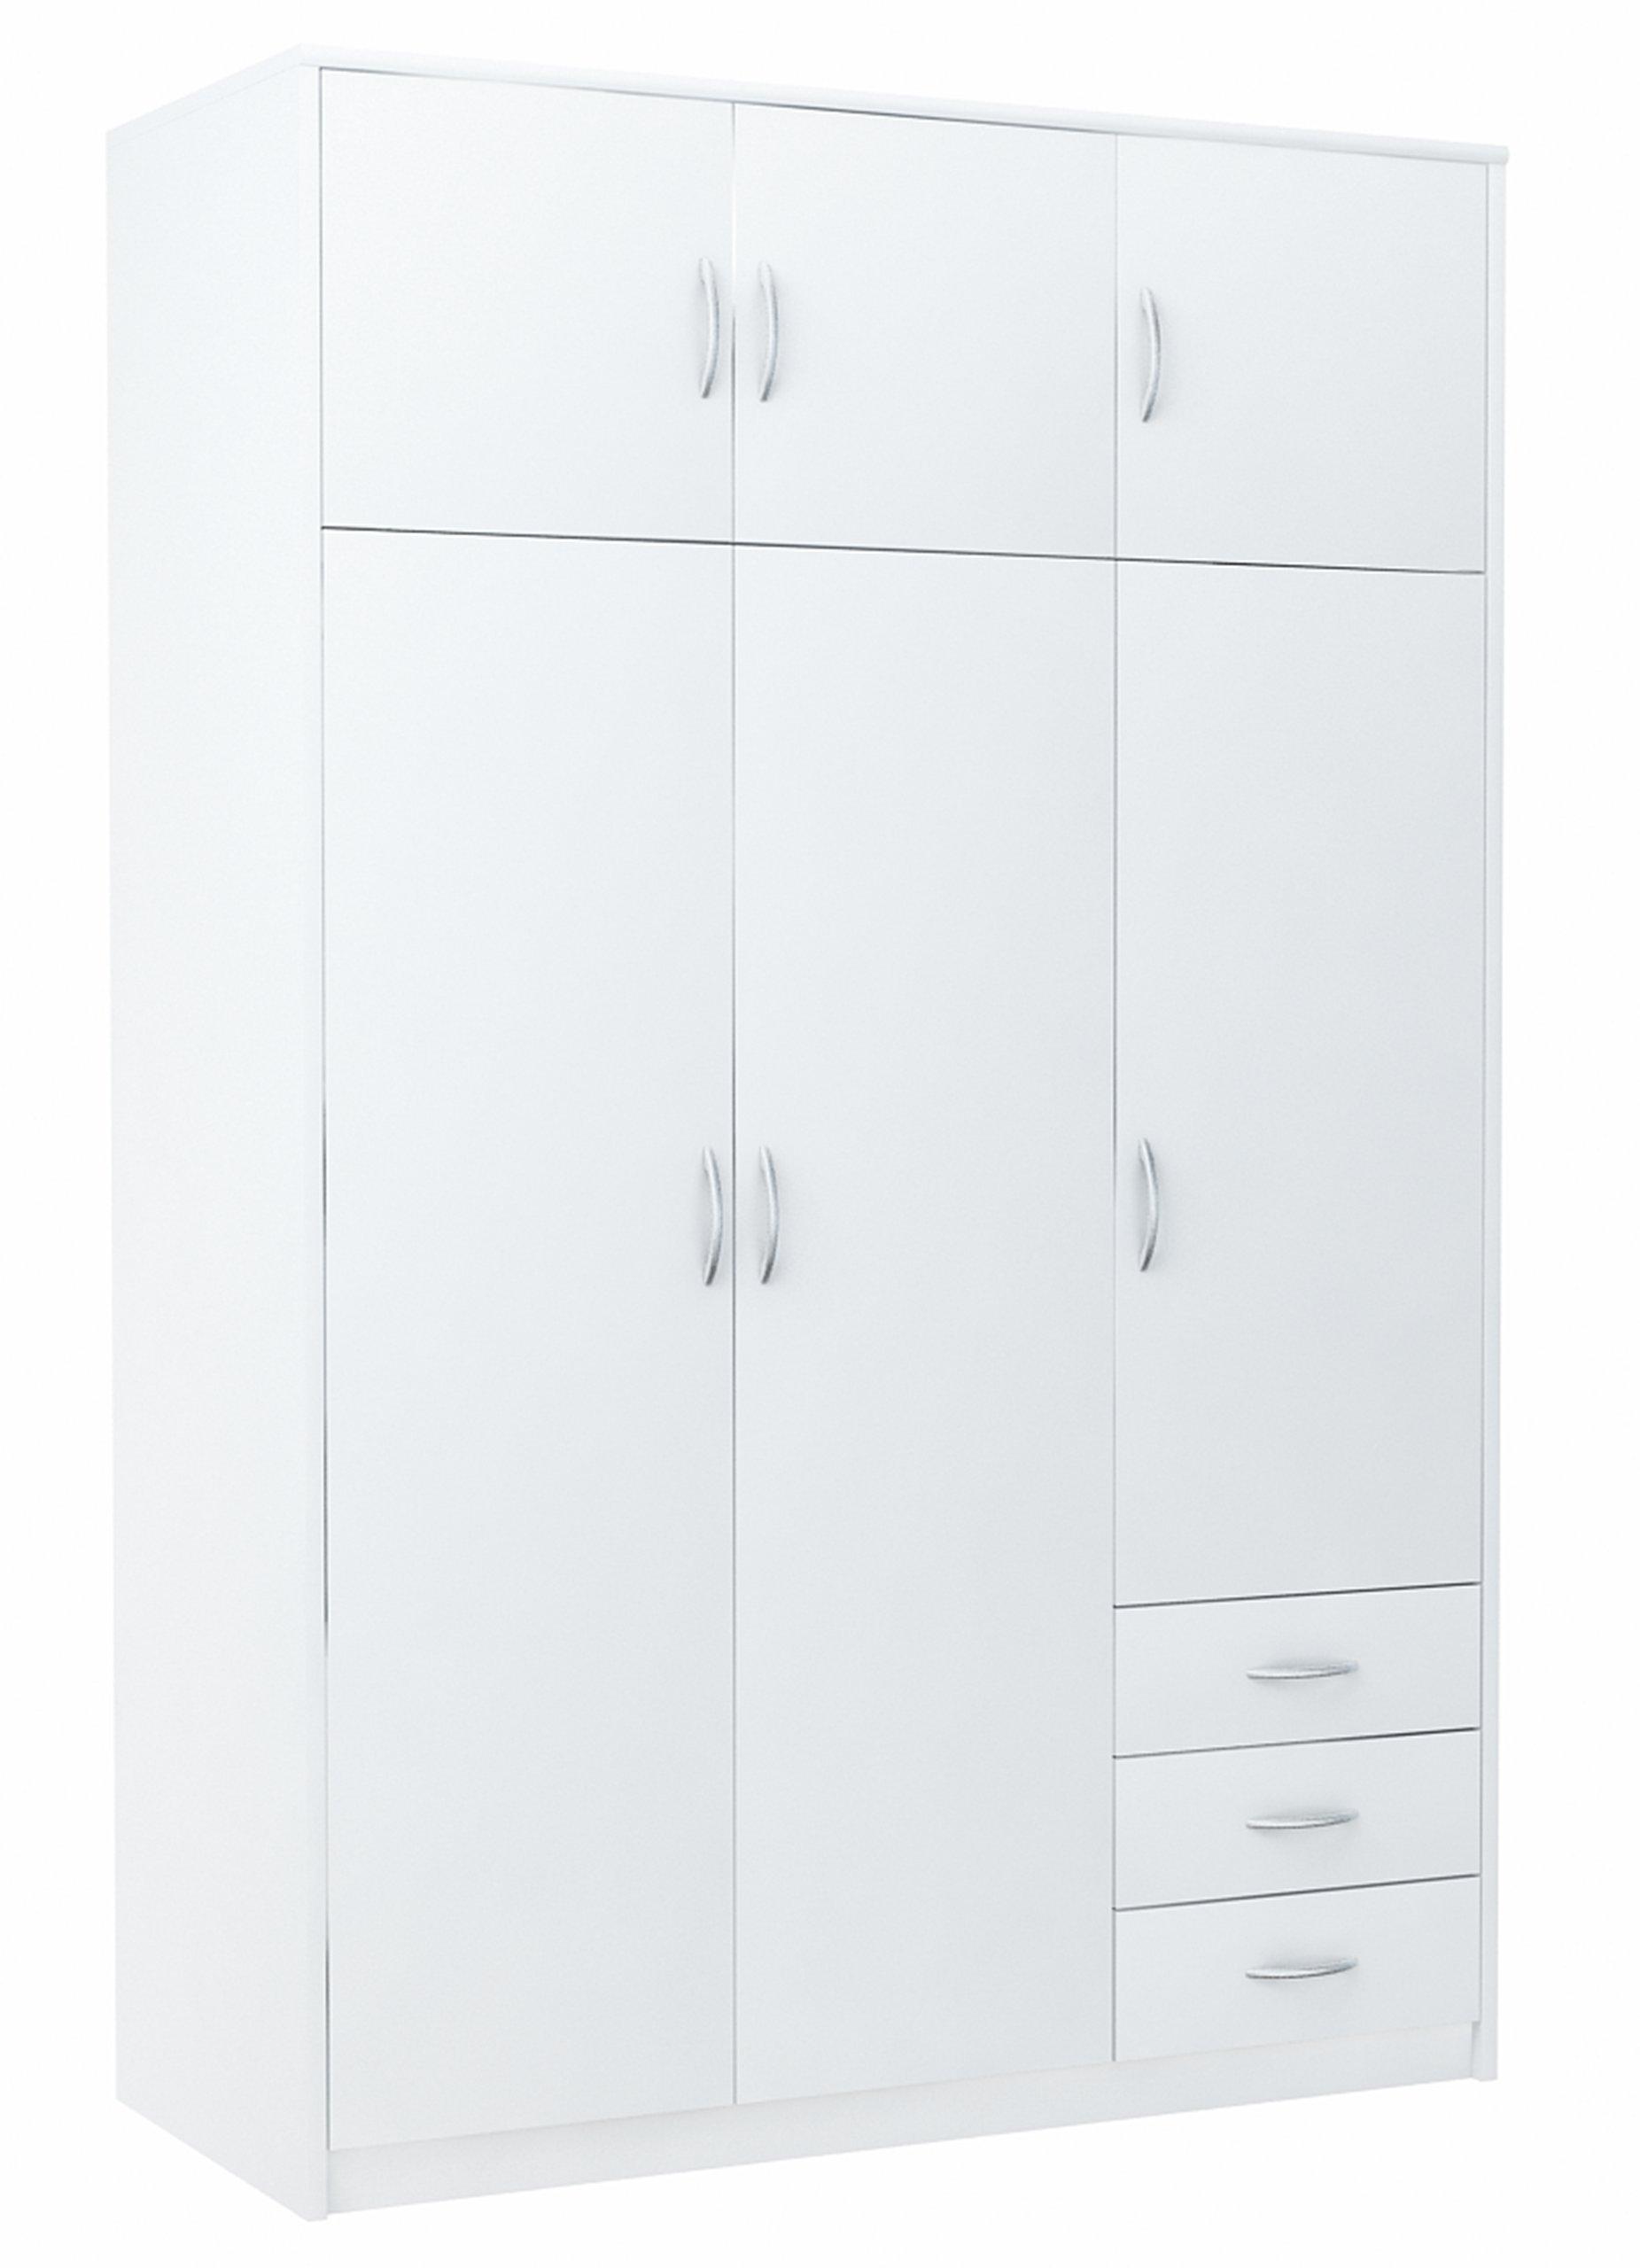 Шкаф платяной 6D3S WHITE 127см, комод, книжный шкаф, полка